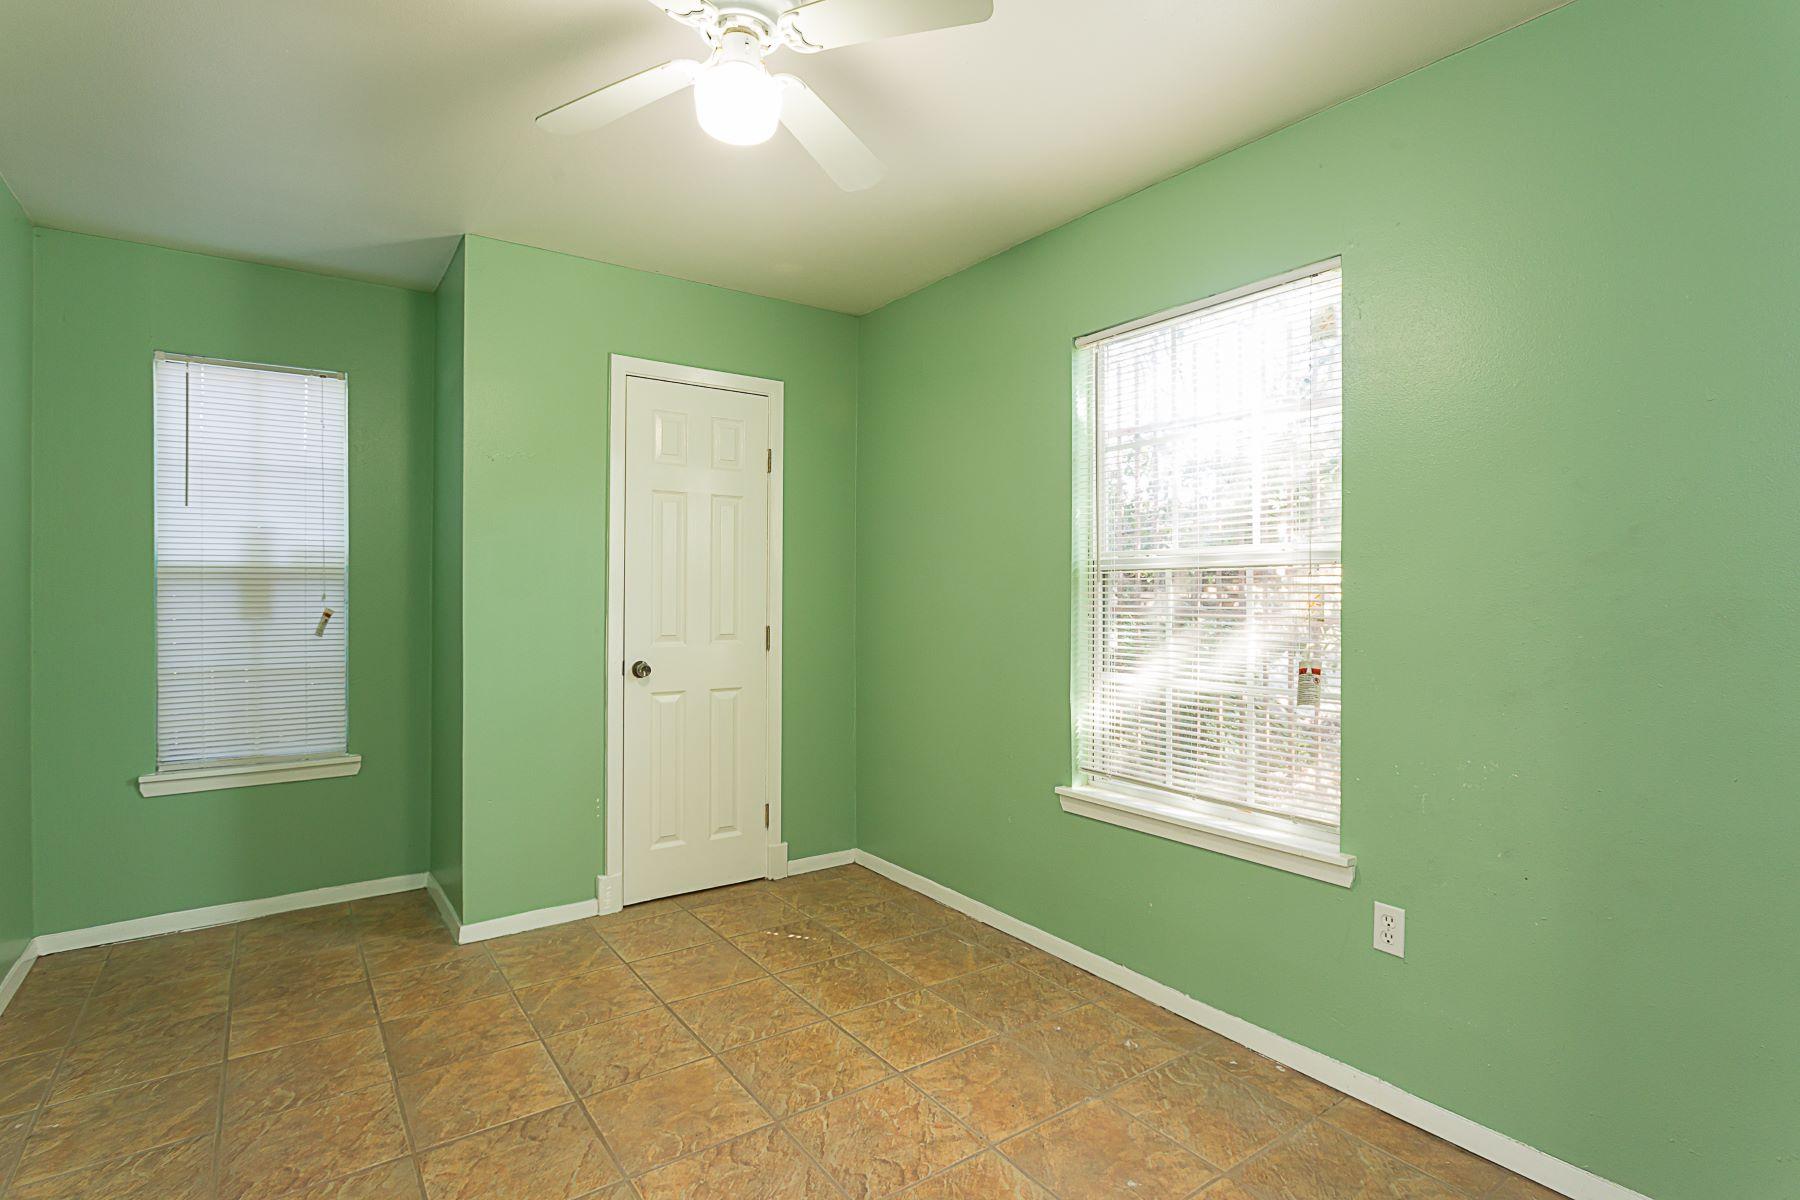 дуплекс для того Аренда на Gullett Gardens Duplex 827 Gullett Street, Austin, Техас, 78702 Соединенные Штаты